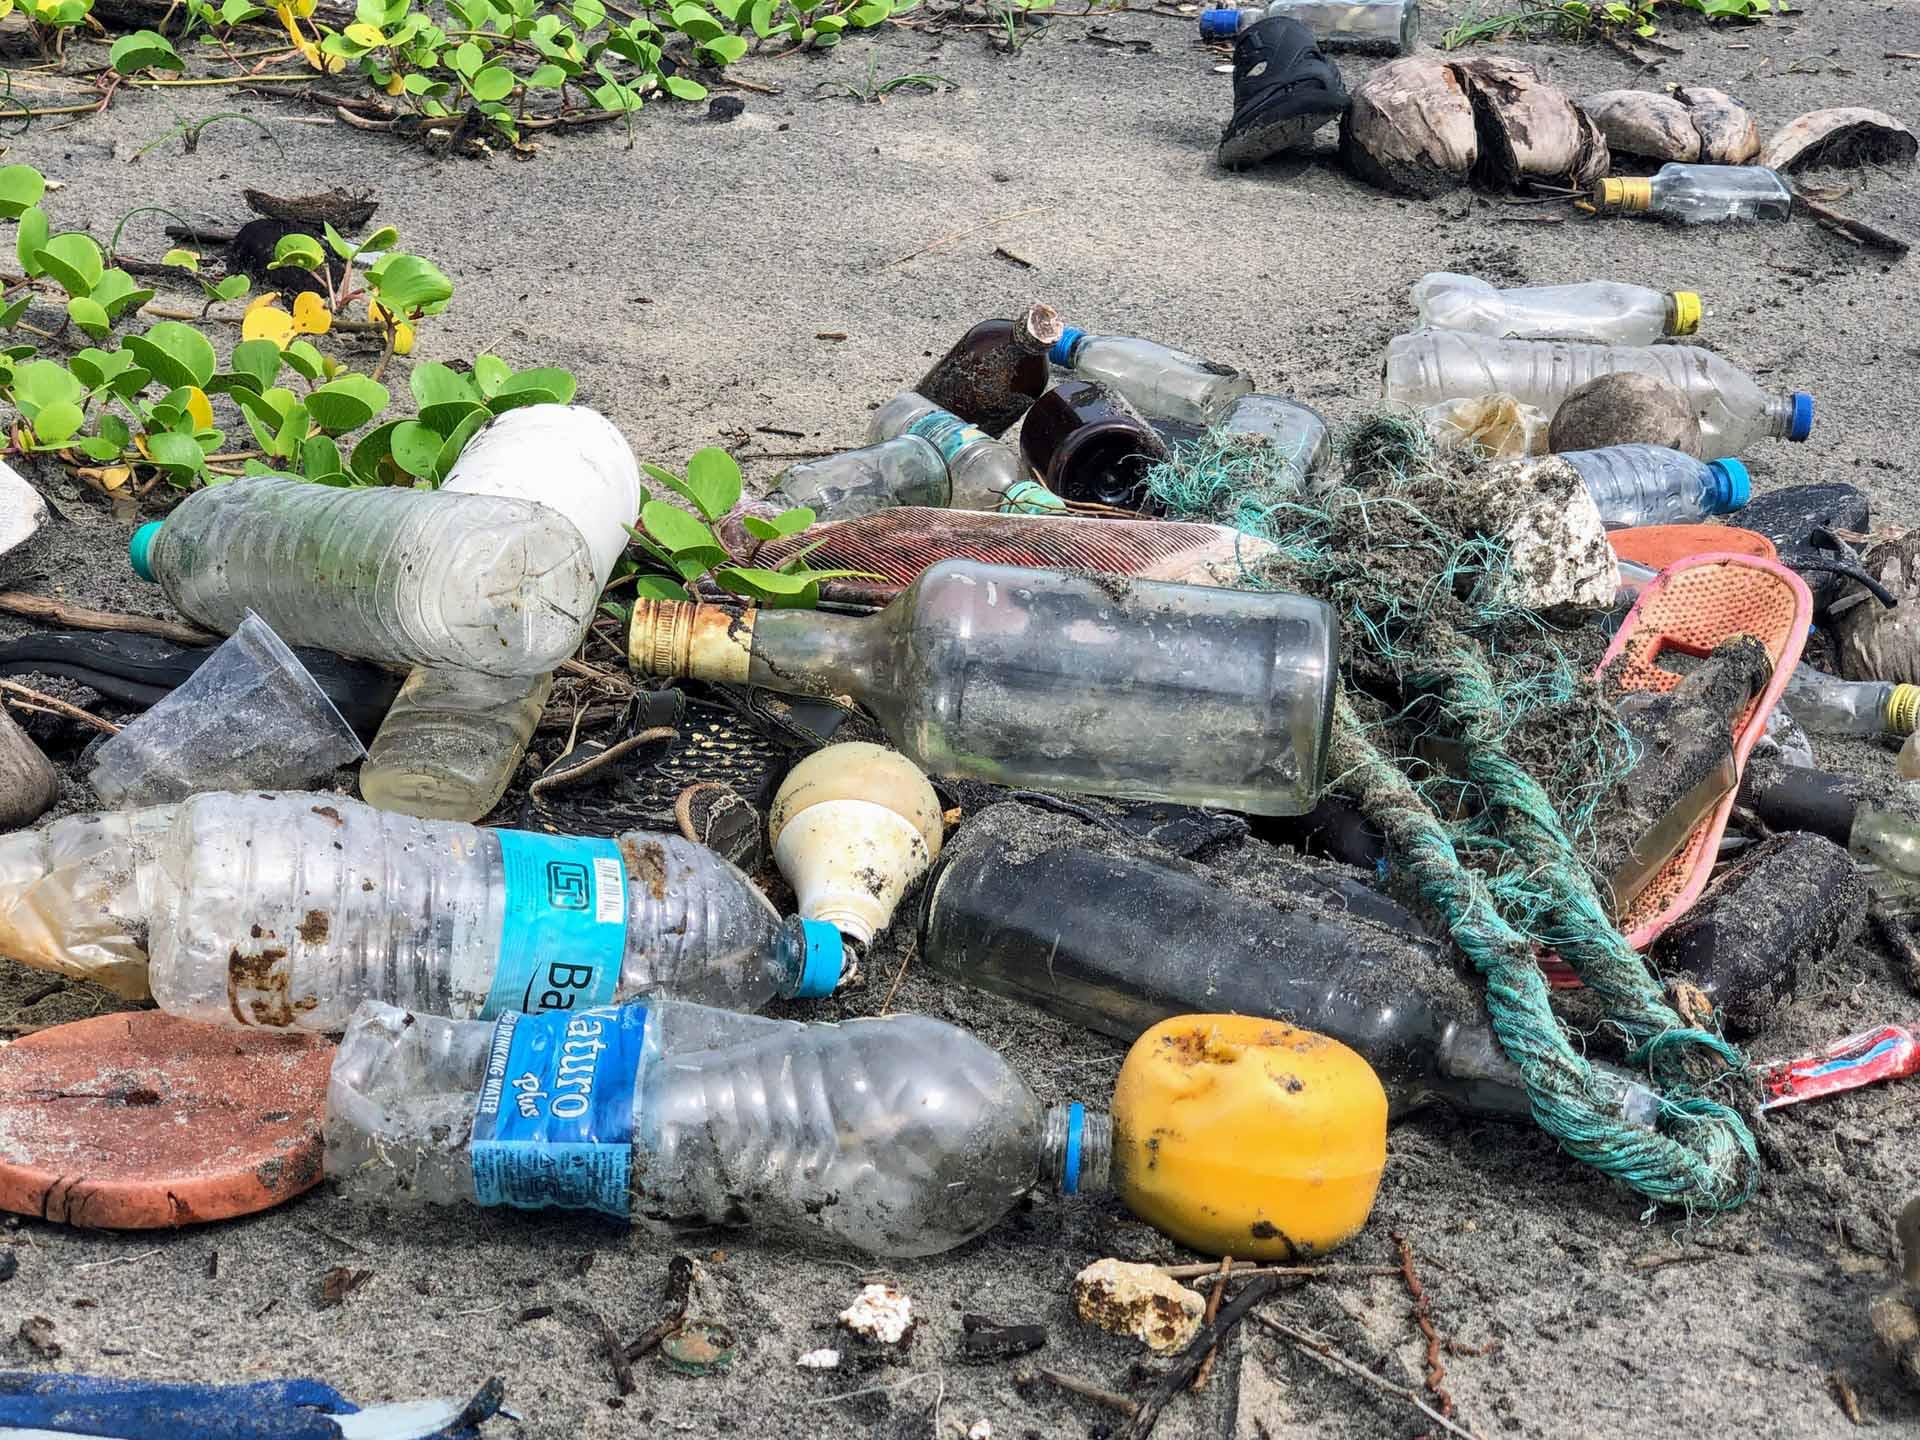 reuse-recycle-reduce-plastic-packaging